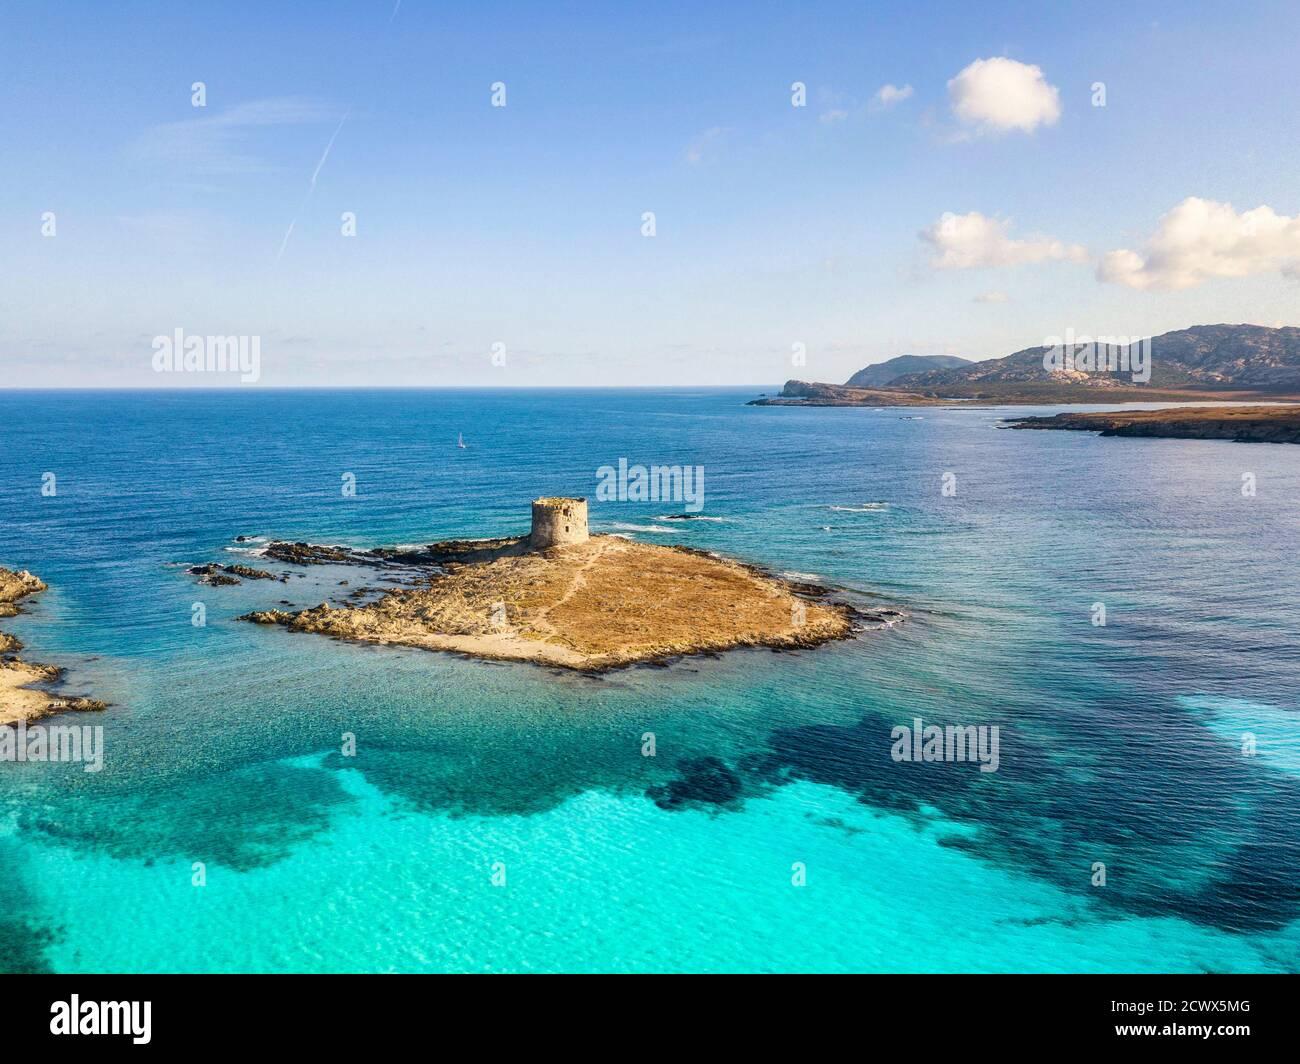 Stintino, türkisfarbenes Meerwasser, Küste und Turm. Sardinien, Italien Stockfoto